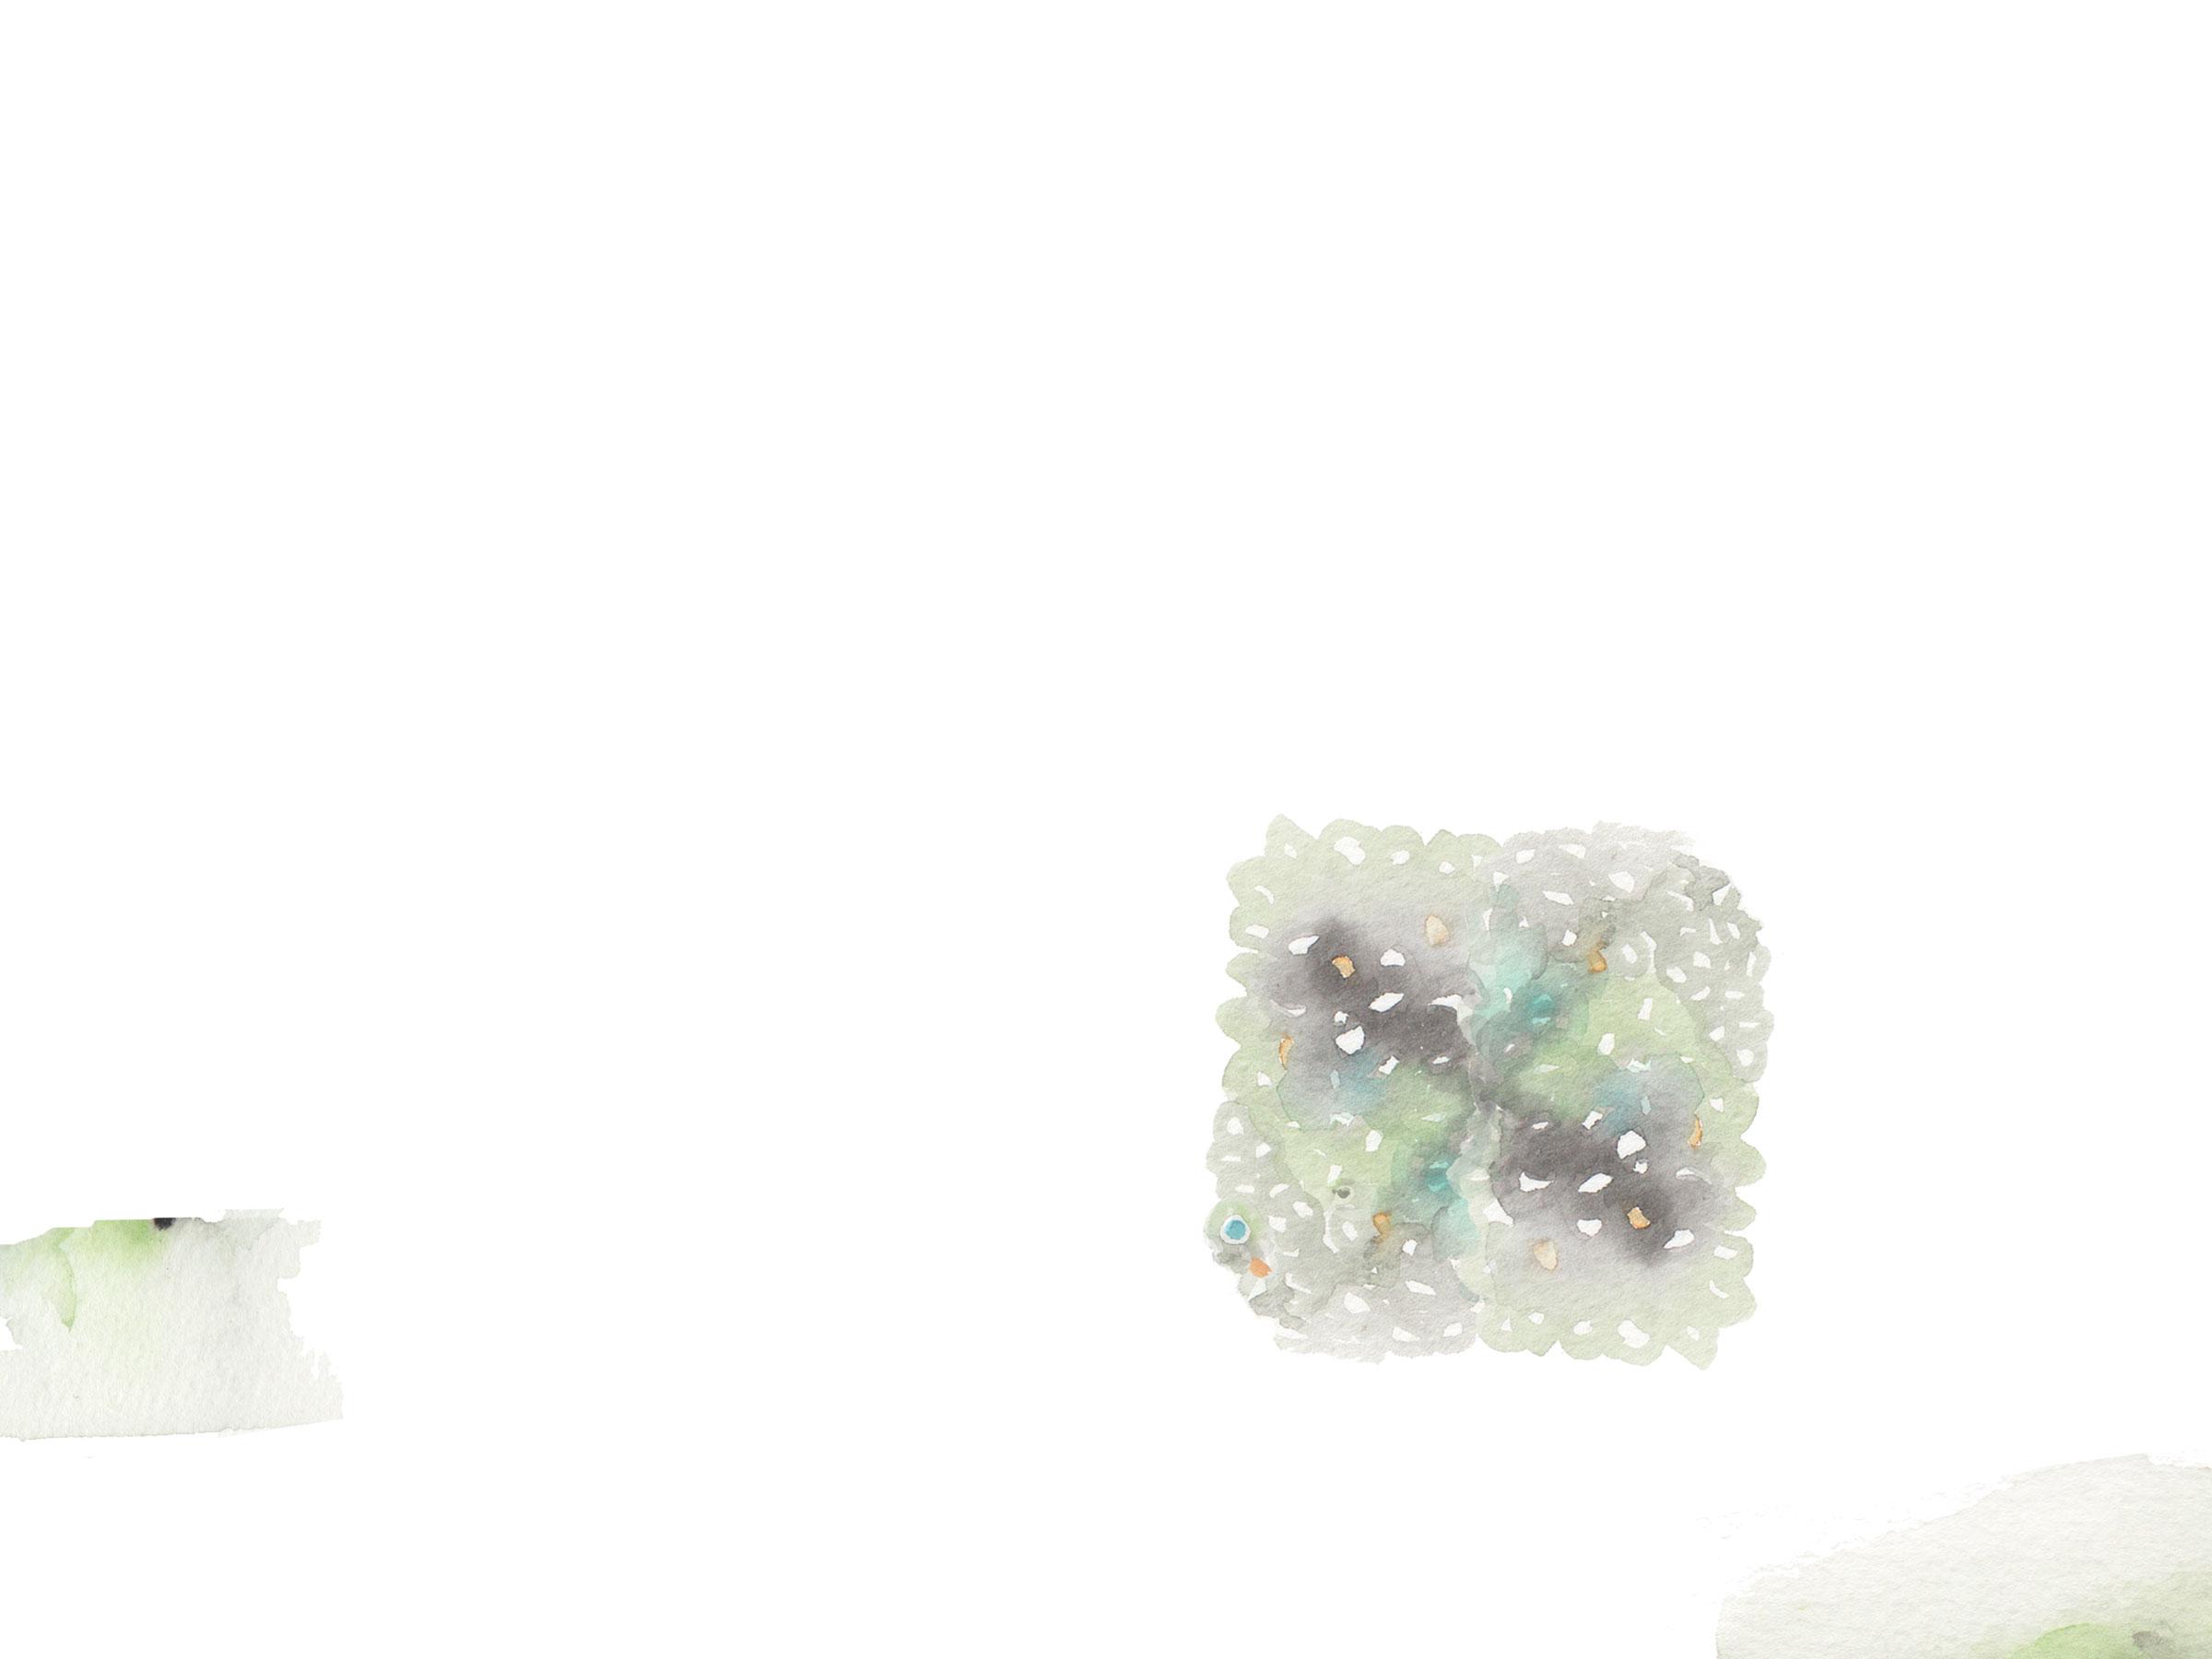 shl_isabel-marant-pattern-detail-Naomi-Yamada.jpg